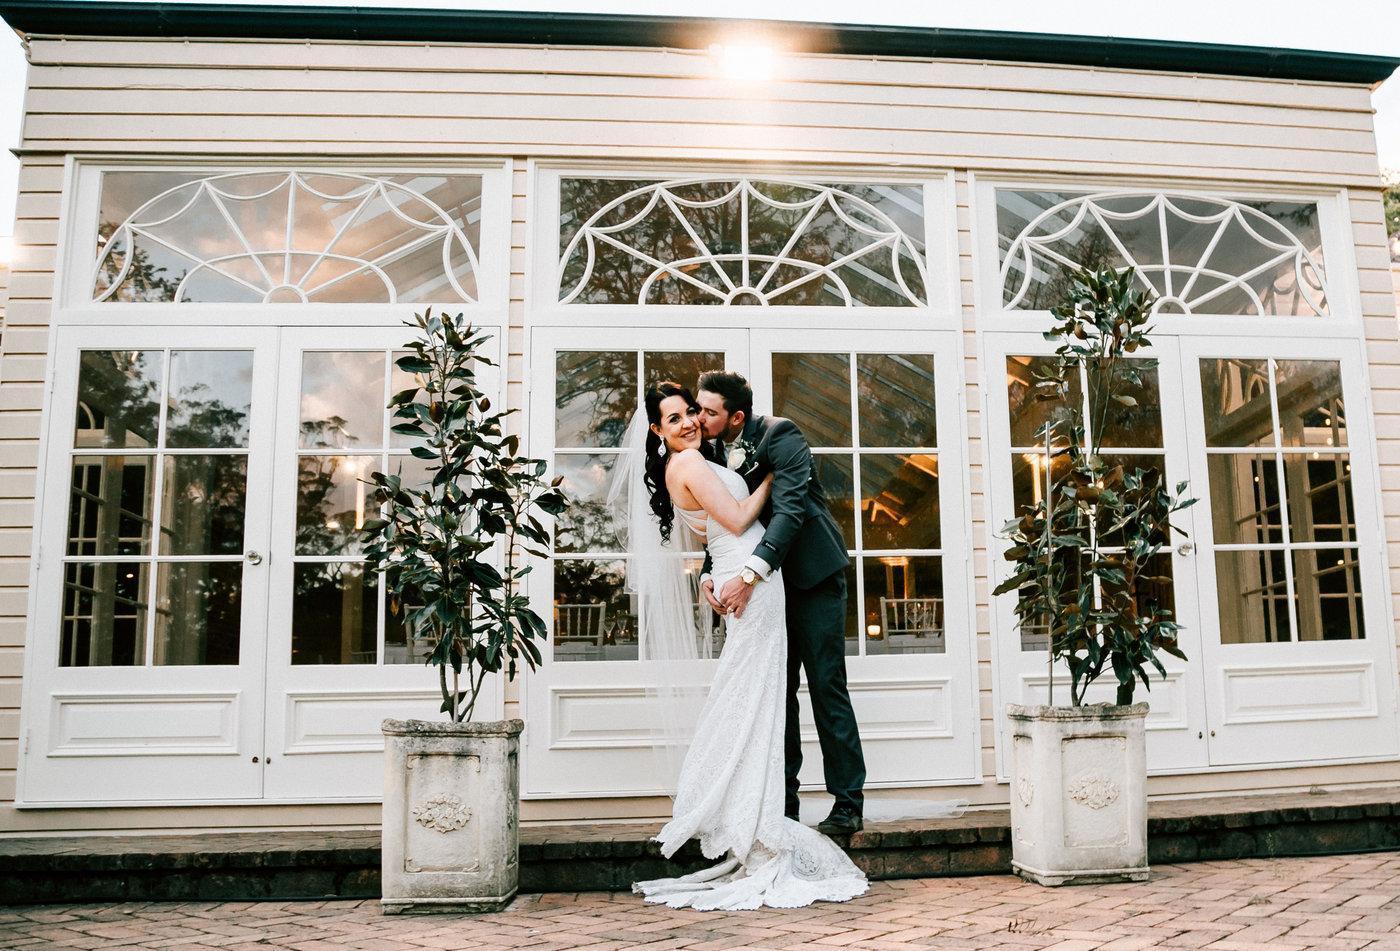 Wedding Photography husband kissing wife's cheek